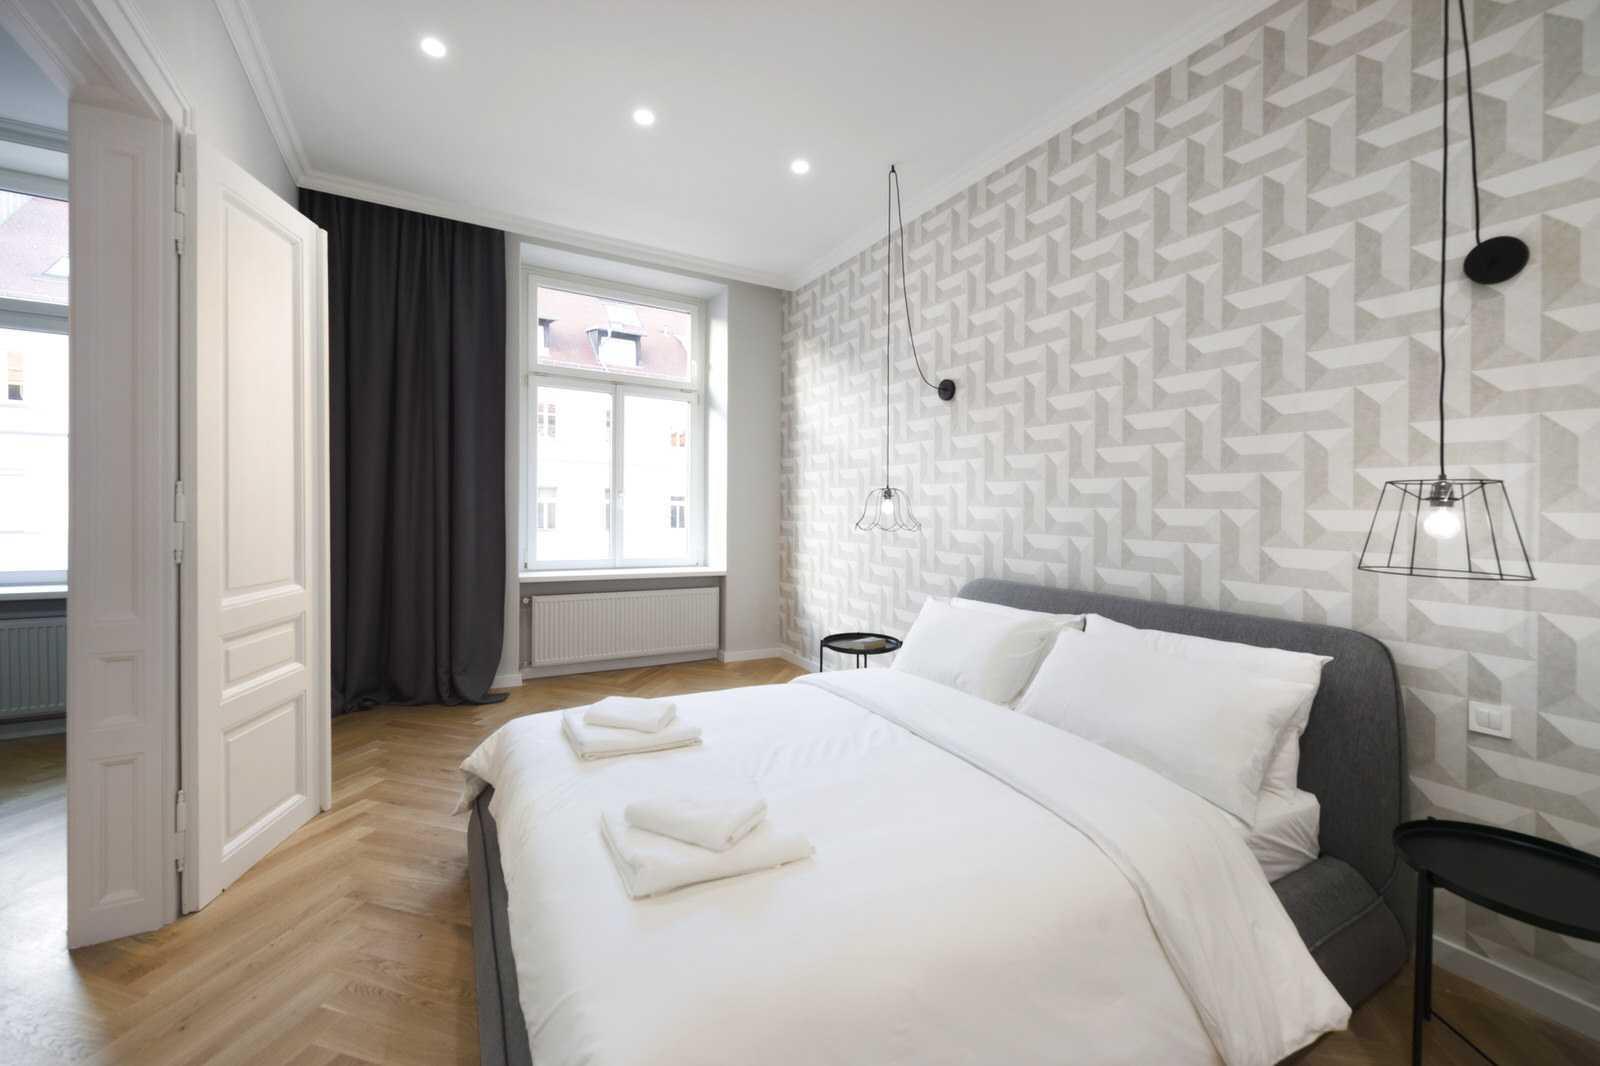 Ljubljana rental apartment Master Bedroom with trendy wallpaper